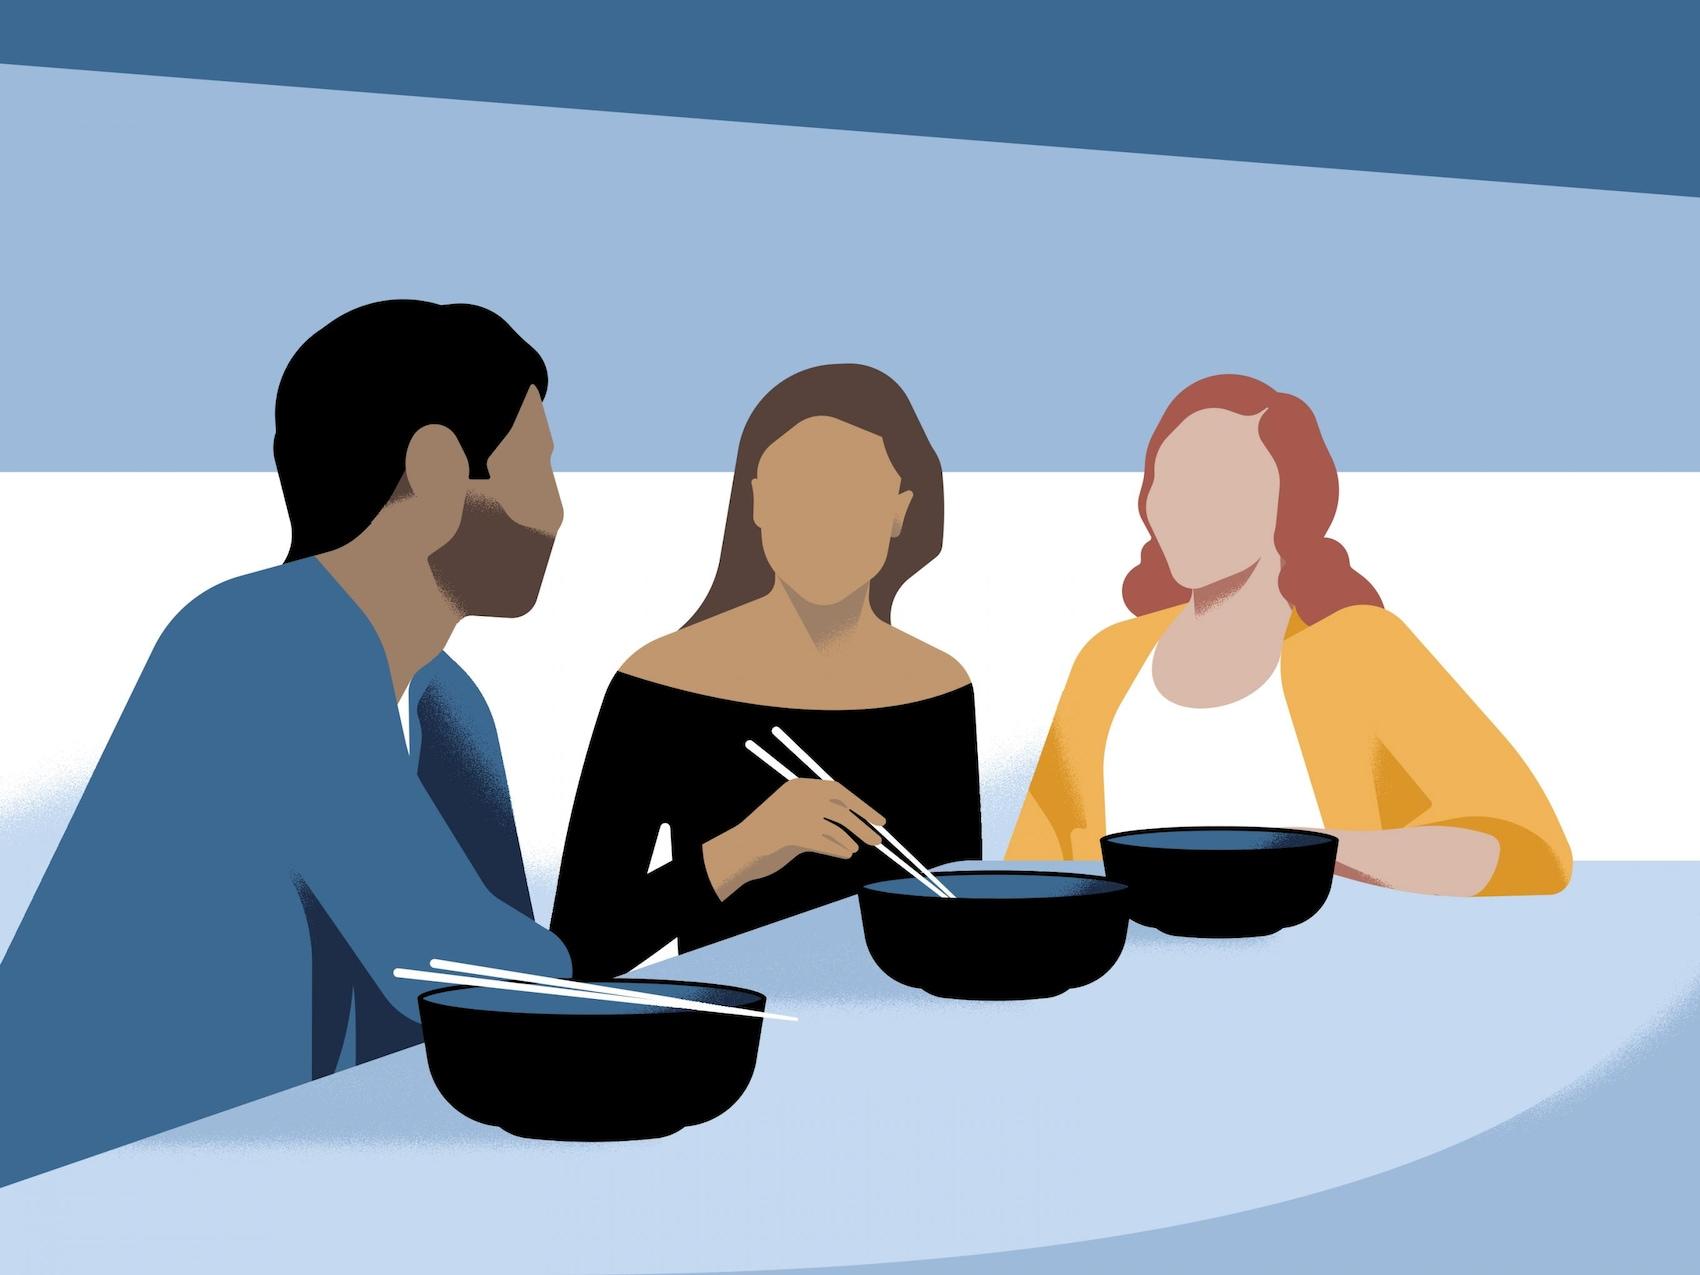 Tre persone cenano insieme sedute a tavola.